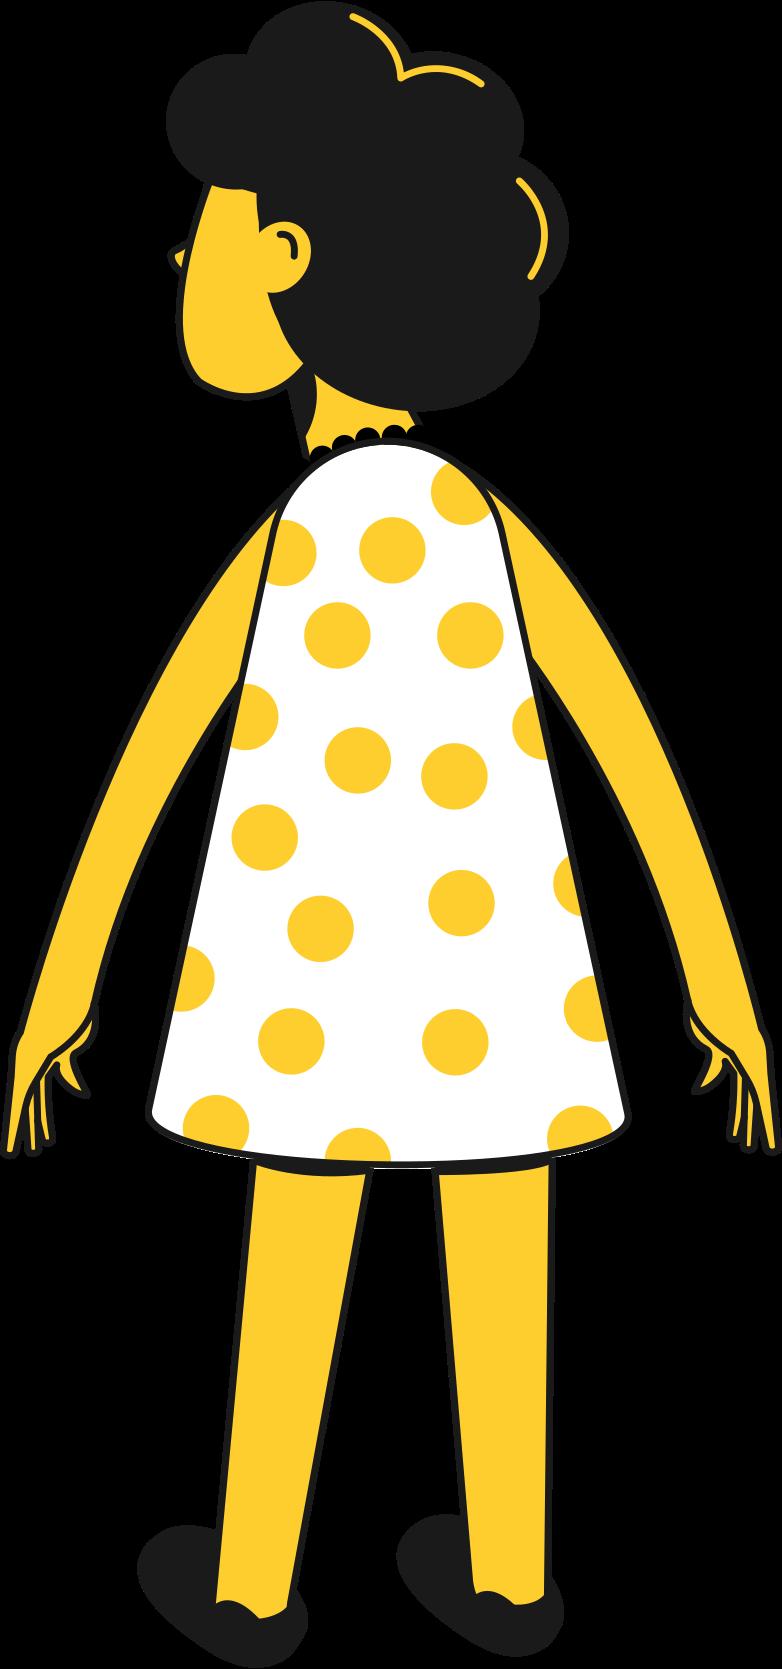 s girl Clipart illustration in PNG, SVG